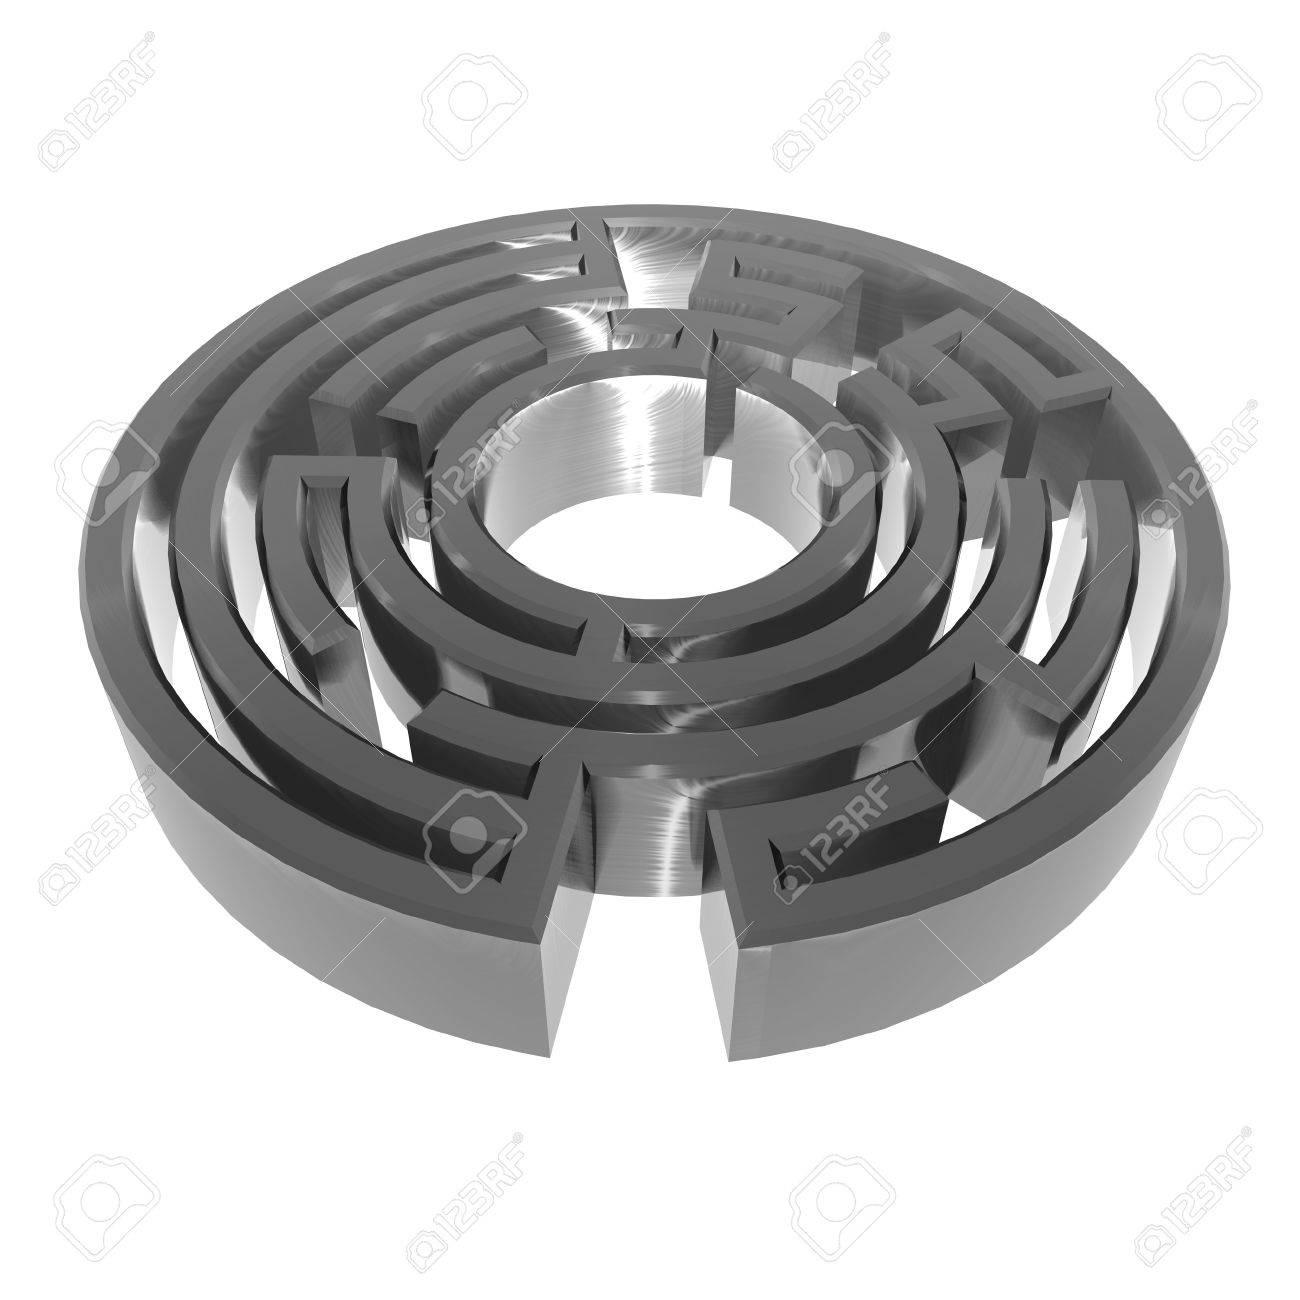 3D illustration of metallic, brushed steel effect maze on white background - 5875880